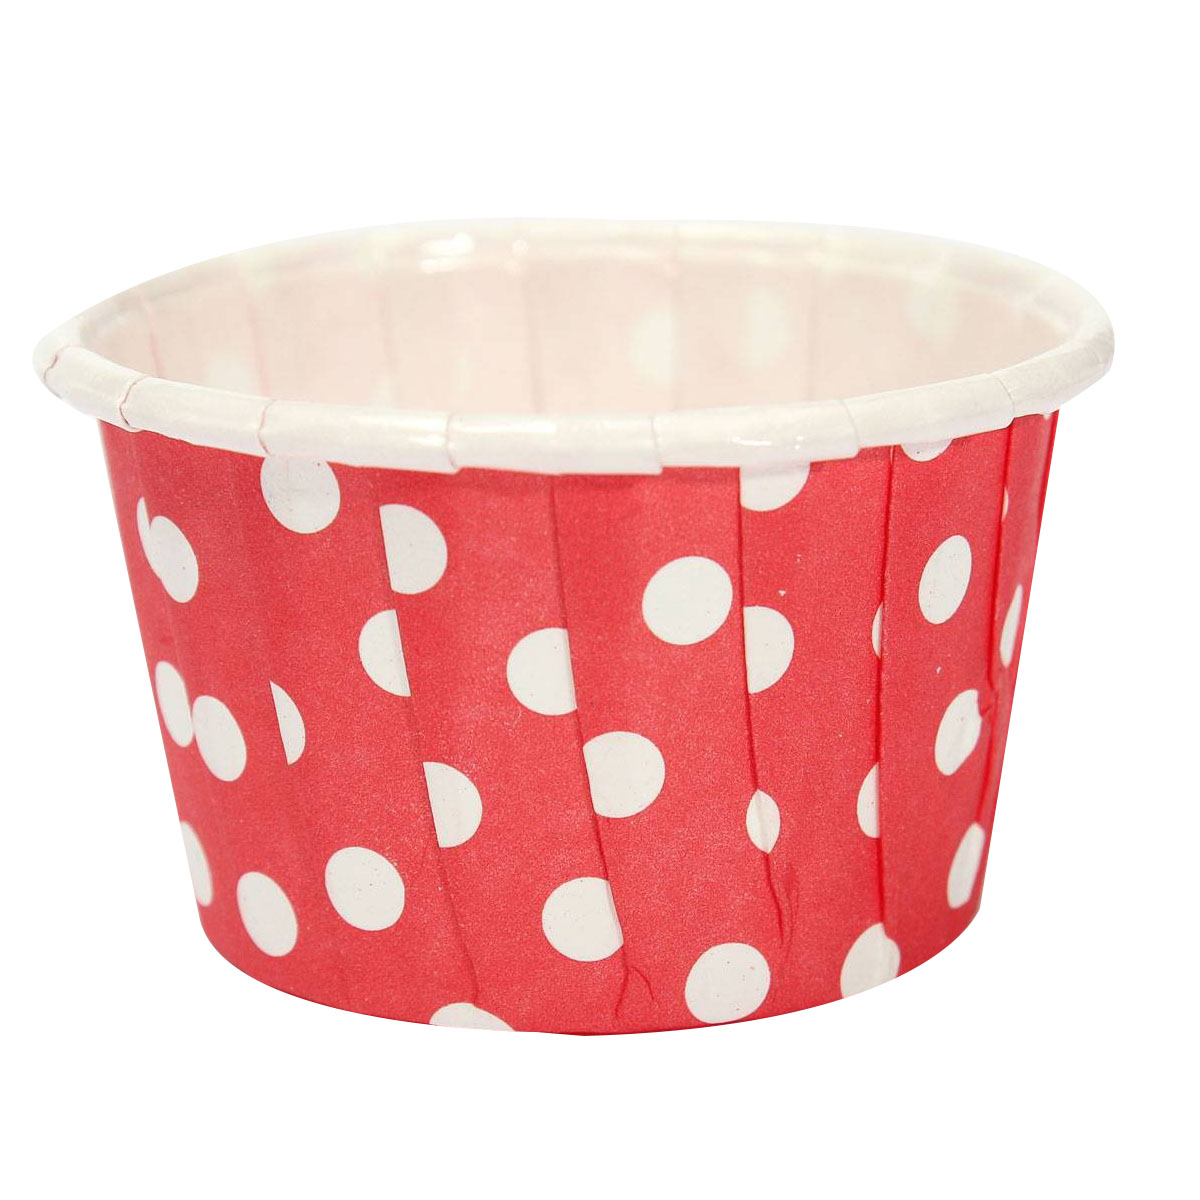 20pcs Paper cupcake paper Liner Paper Cake Muffin Case Dessert Baking Cups Red